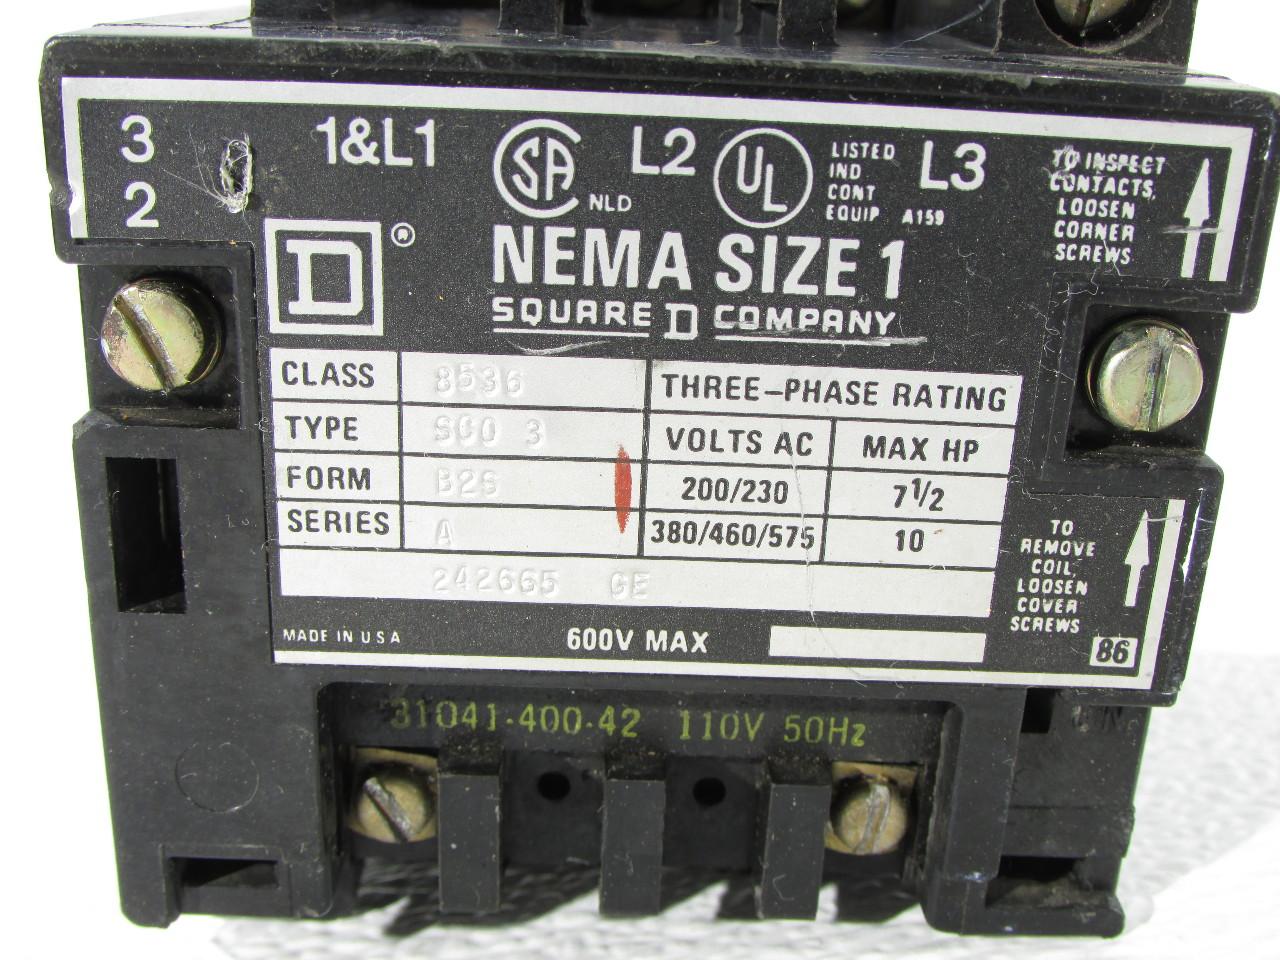 square d 8536 motor starter wiring diagram 2001 chevy tahoe ac nema size 1 premier